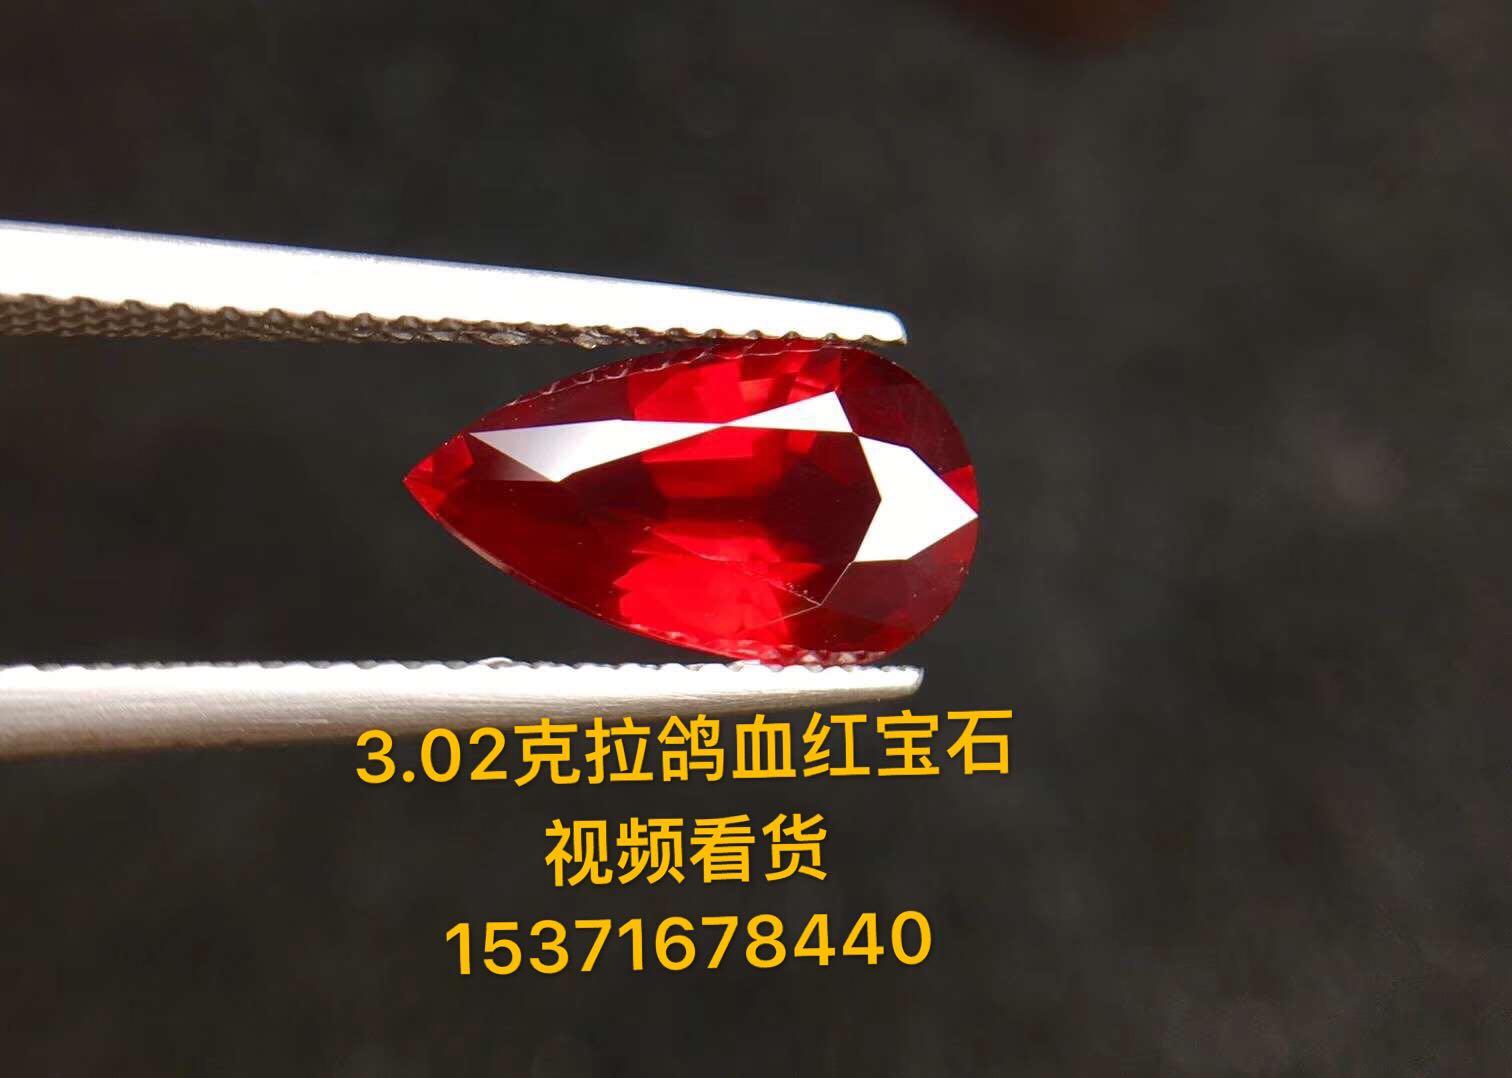 GRS3.02克拉鸽血红宝石水滴戒指吊坠裸石专卖 代设计镶嵌